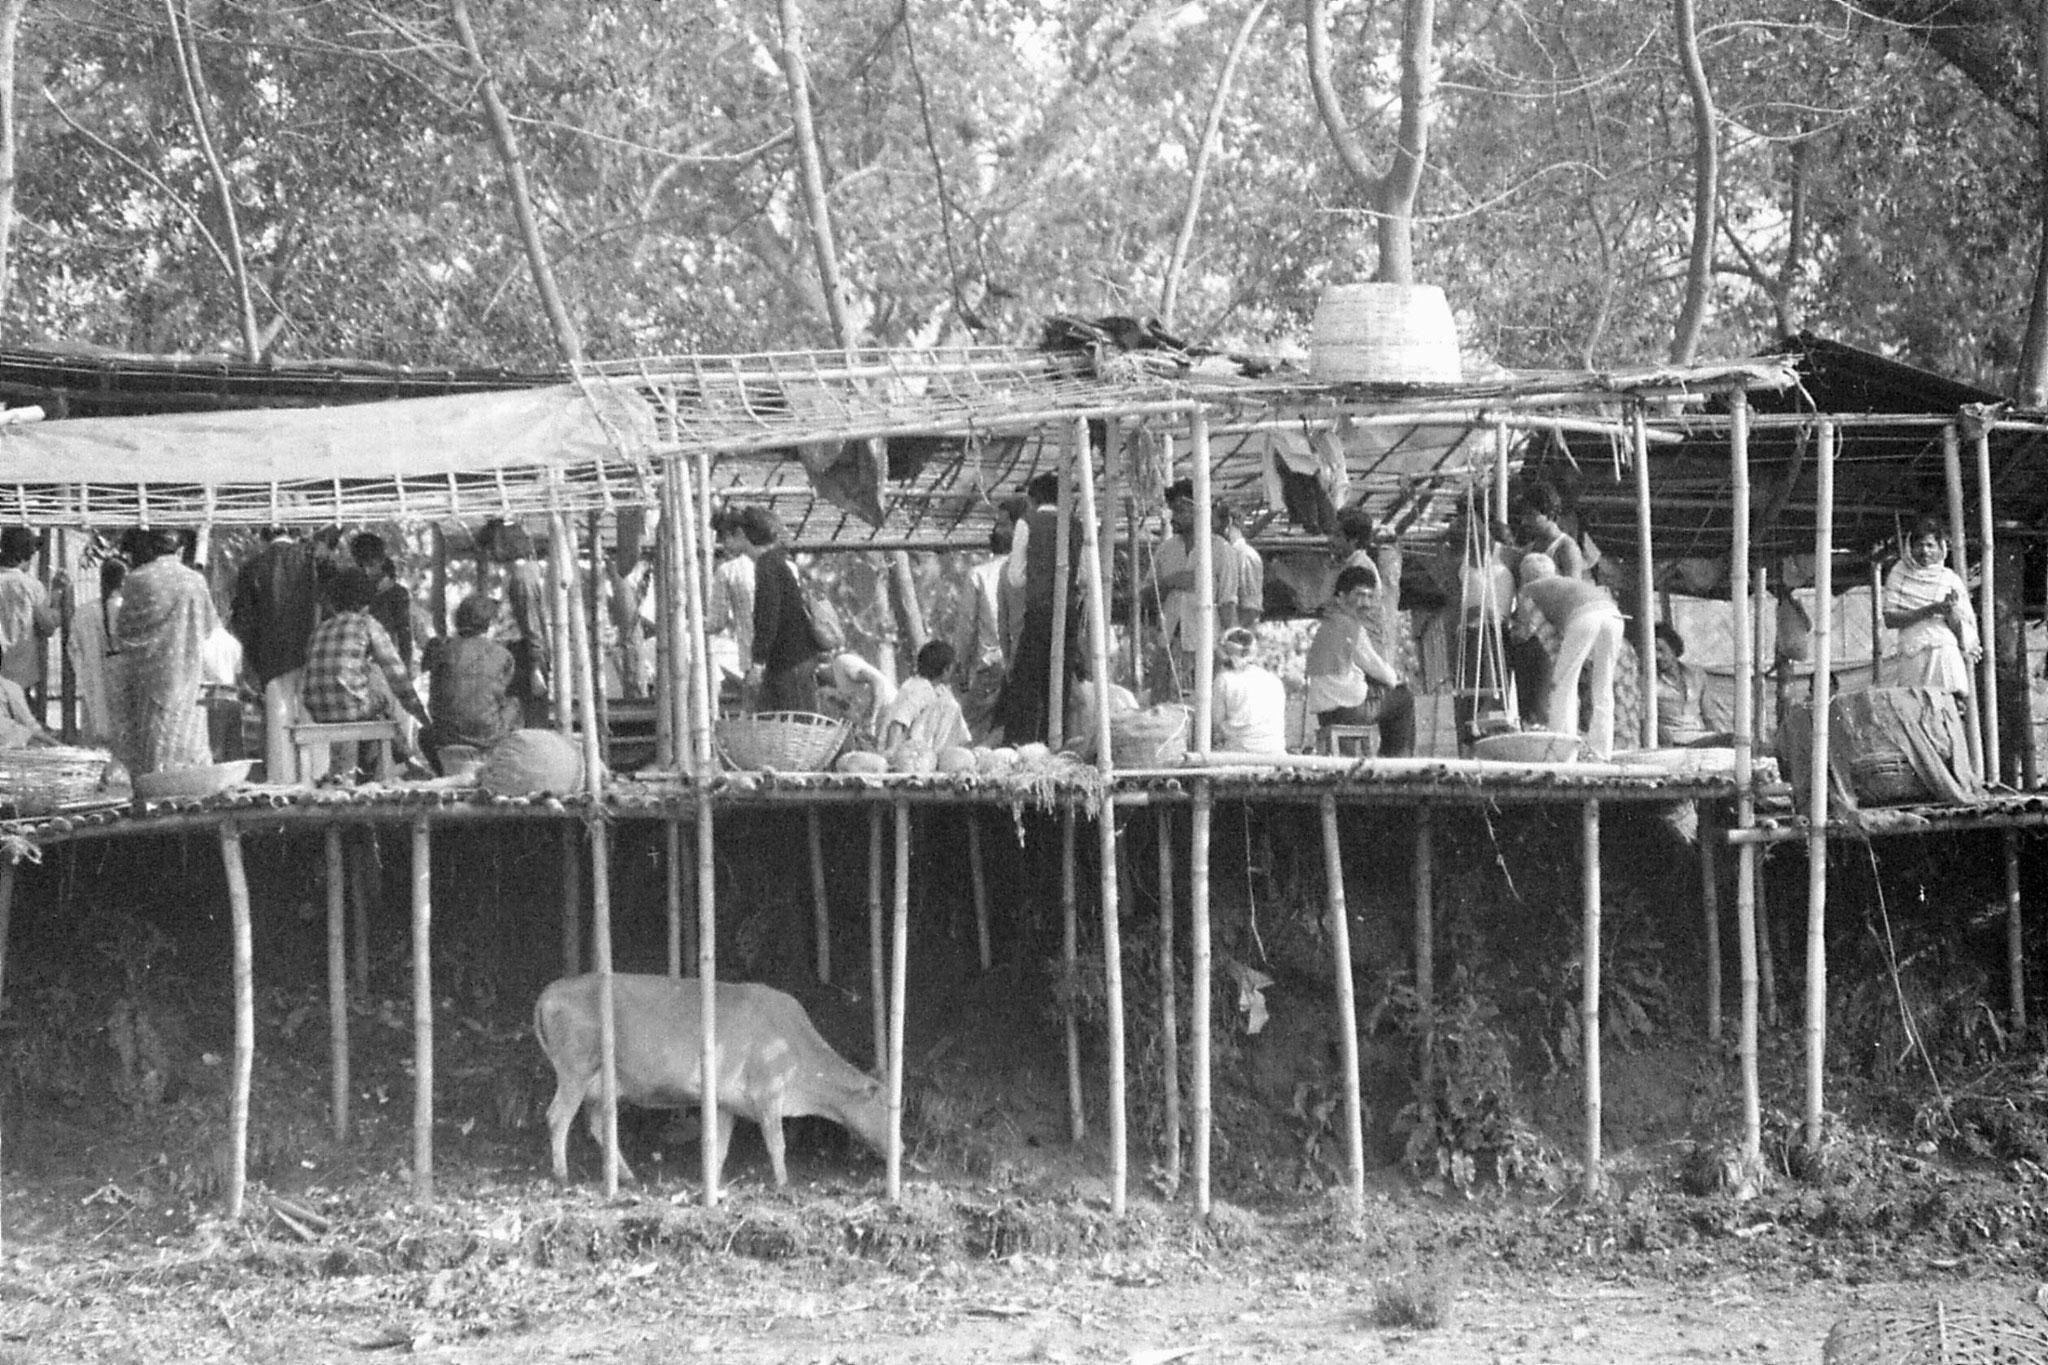 10/4/1990: 32: Gauhati, Brahmaputra River, market